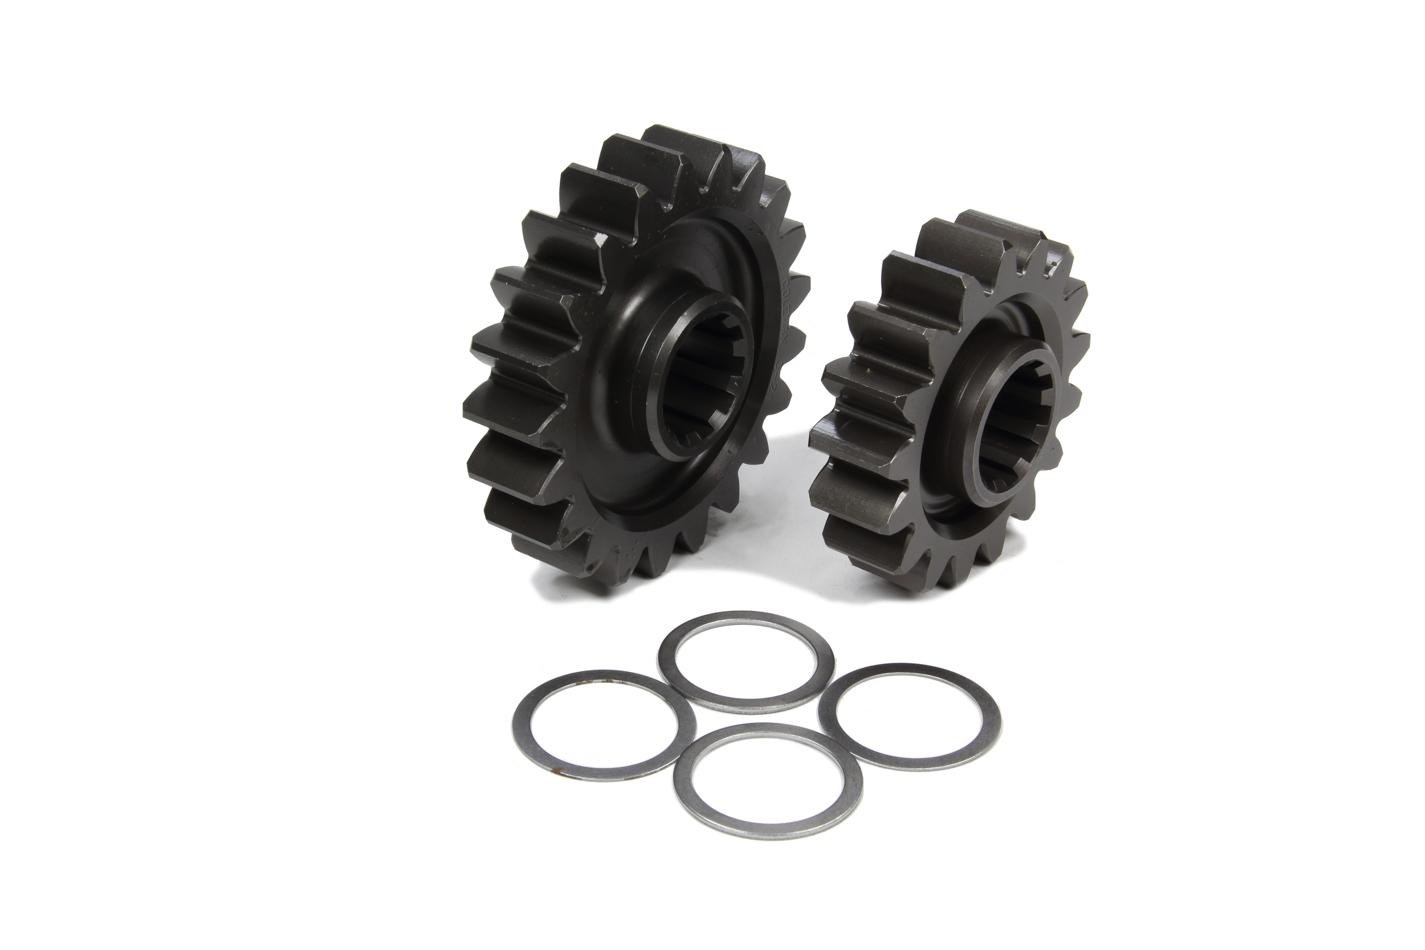 Coleman Machine 207-3 Quick Change Gear Set, Pro-Lite, Set 3, 10 Spline, 4.11 Ratio 5.08 / 3.32, 4.86 Ratio 6.00 / 3.93, Steel, Each